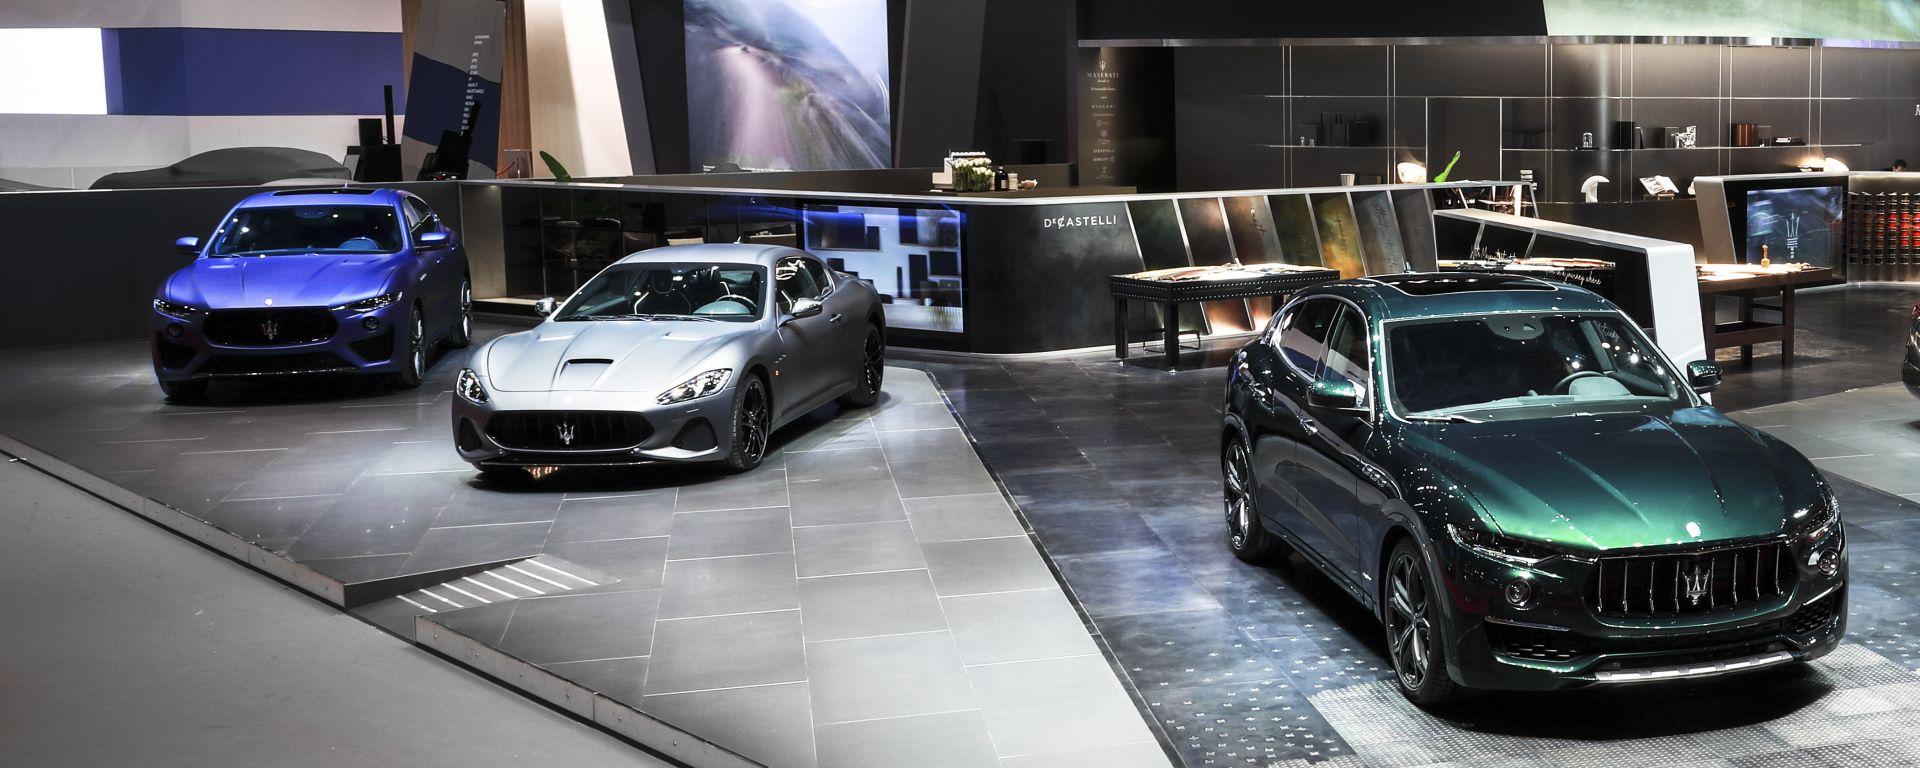 Salone di Ginevra 2019, lo stand Maserati